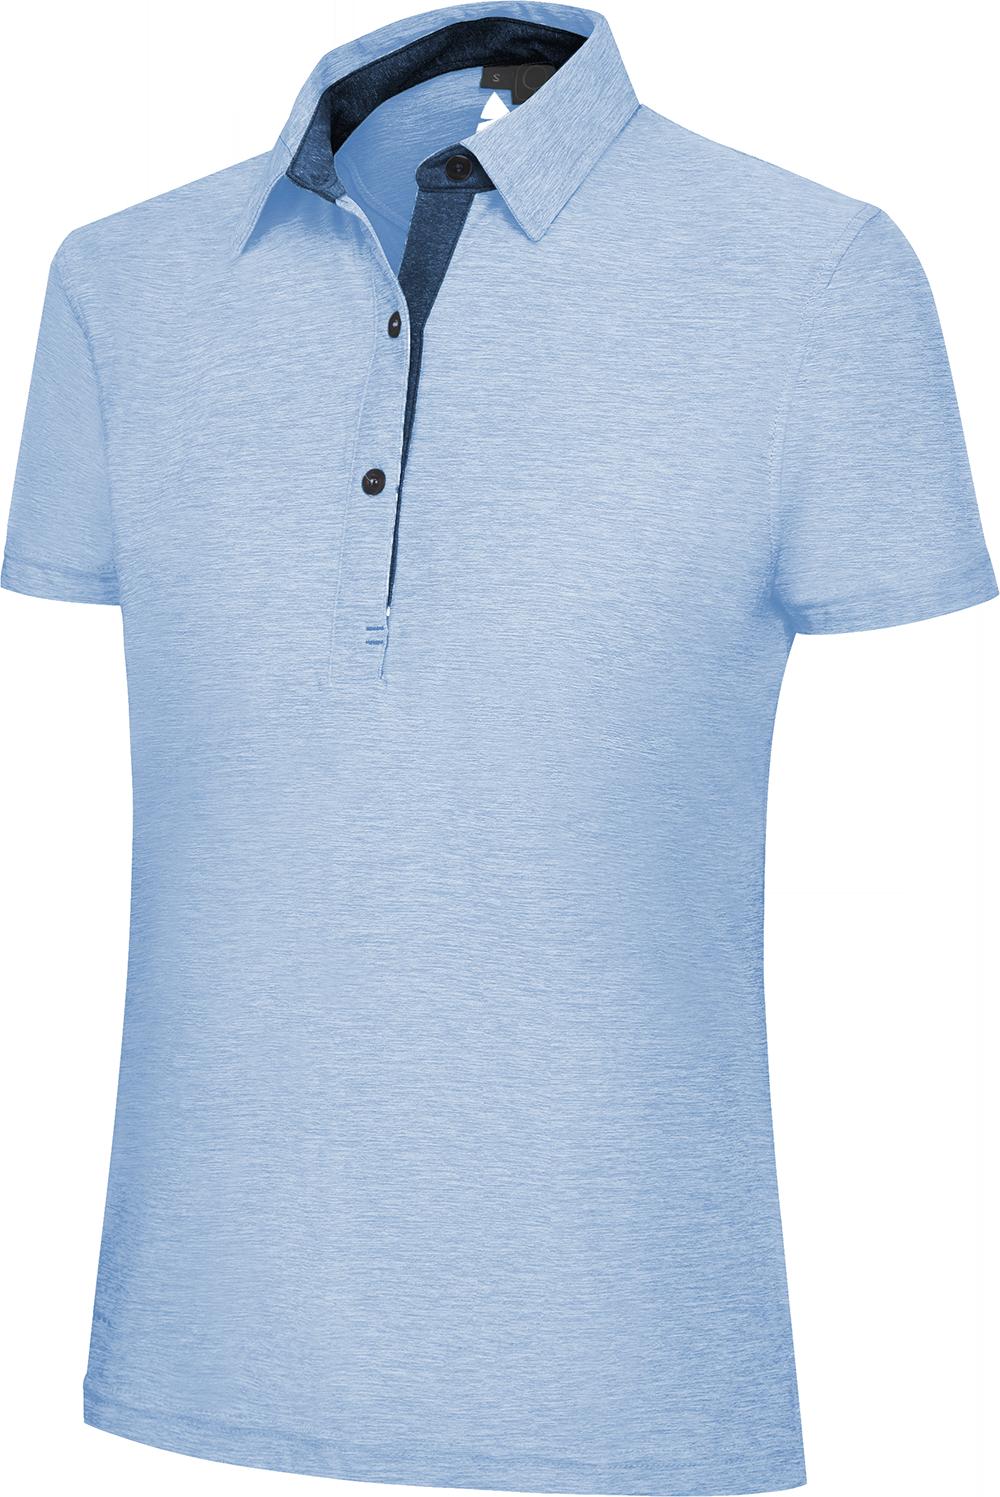 T shirt & polo Kampagne Magenta Firmagaver